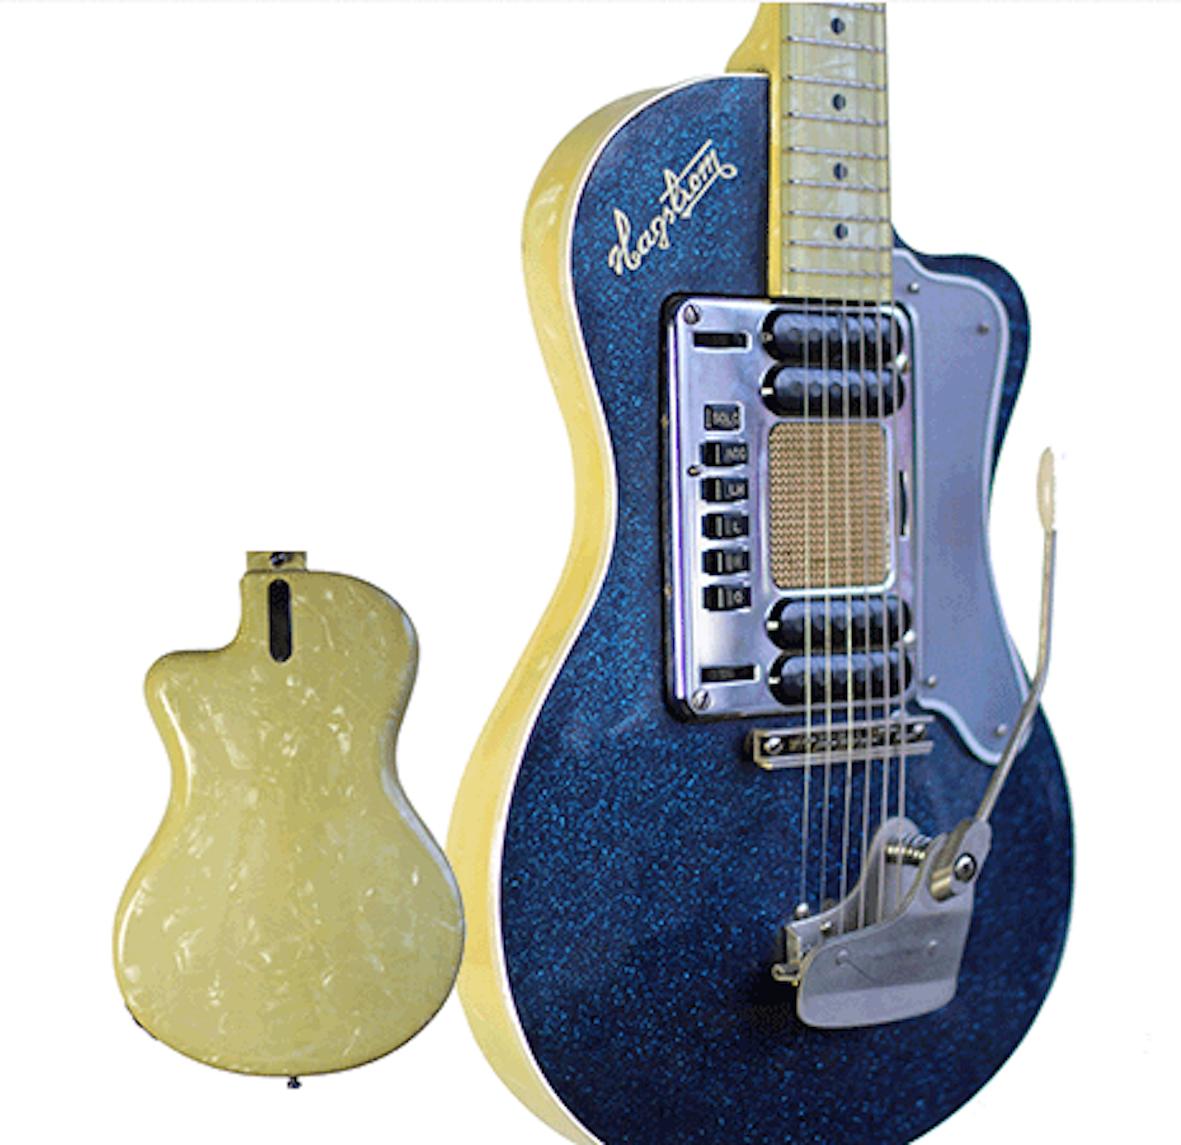 La chitarra di Kurt Cobain